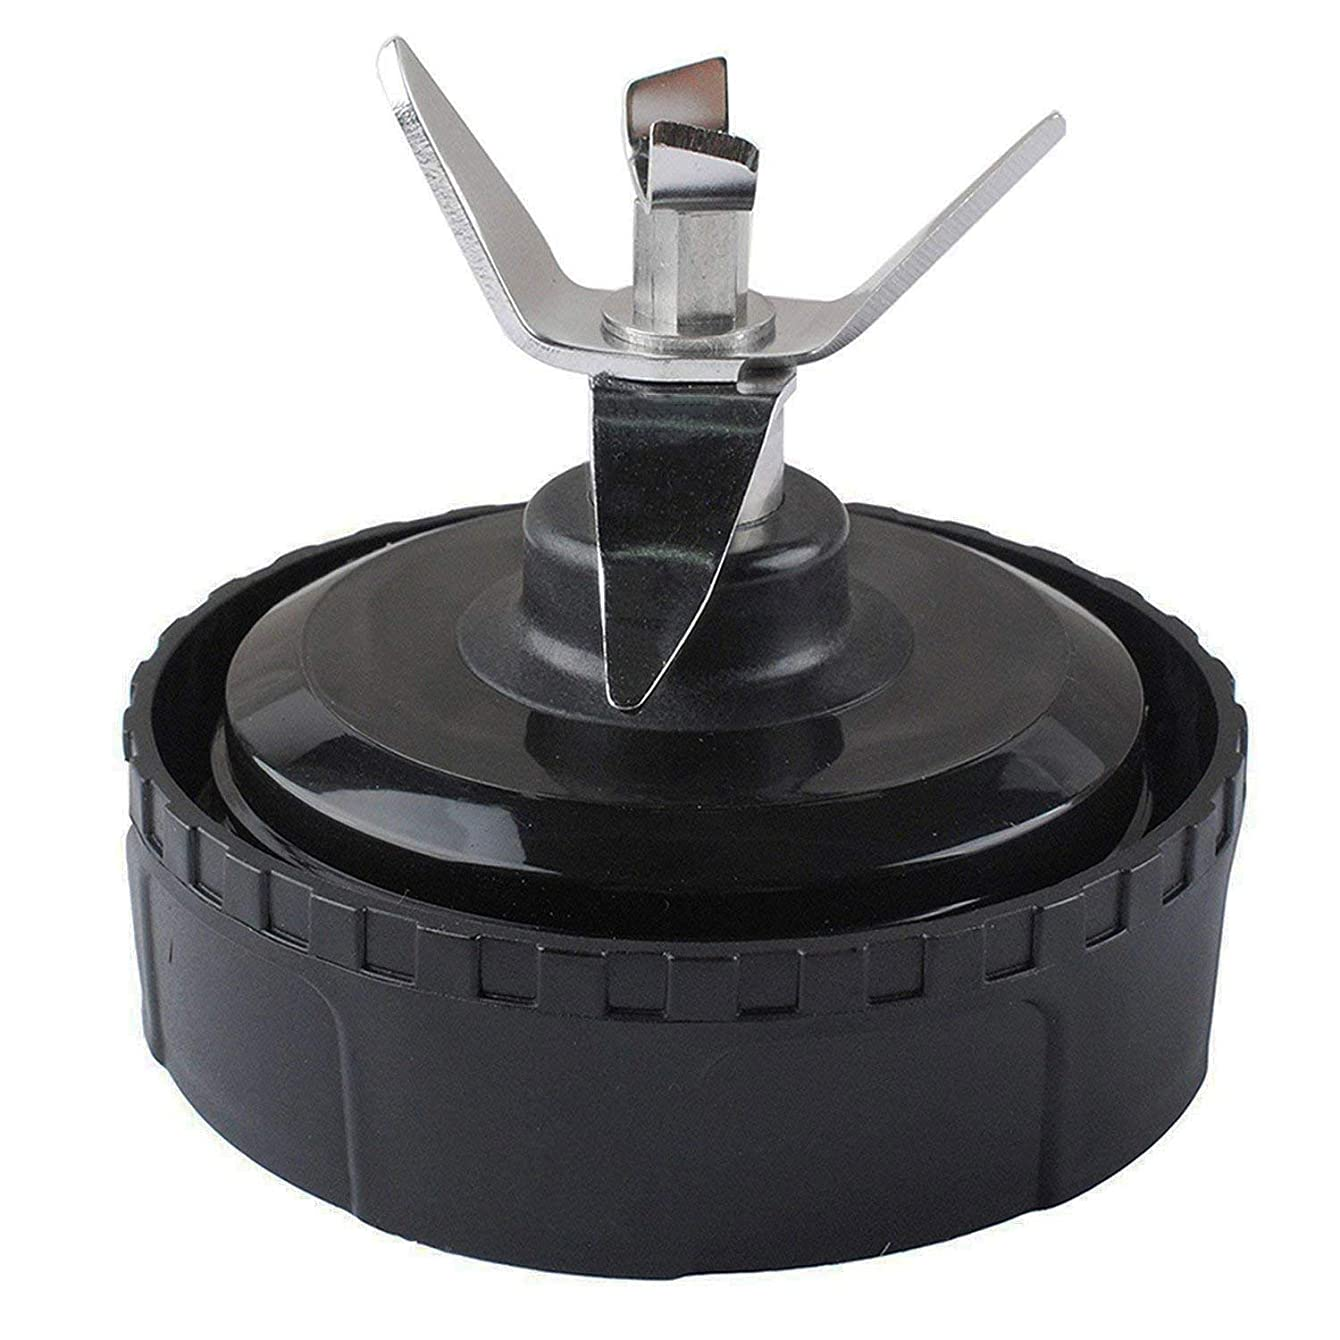 Blade for Nutri Ninja Blender Replacement Parts Accessories for Ninja BL660 BL770 BL740 BL771 BL773CO (6 Fins)